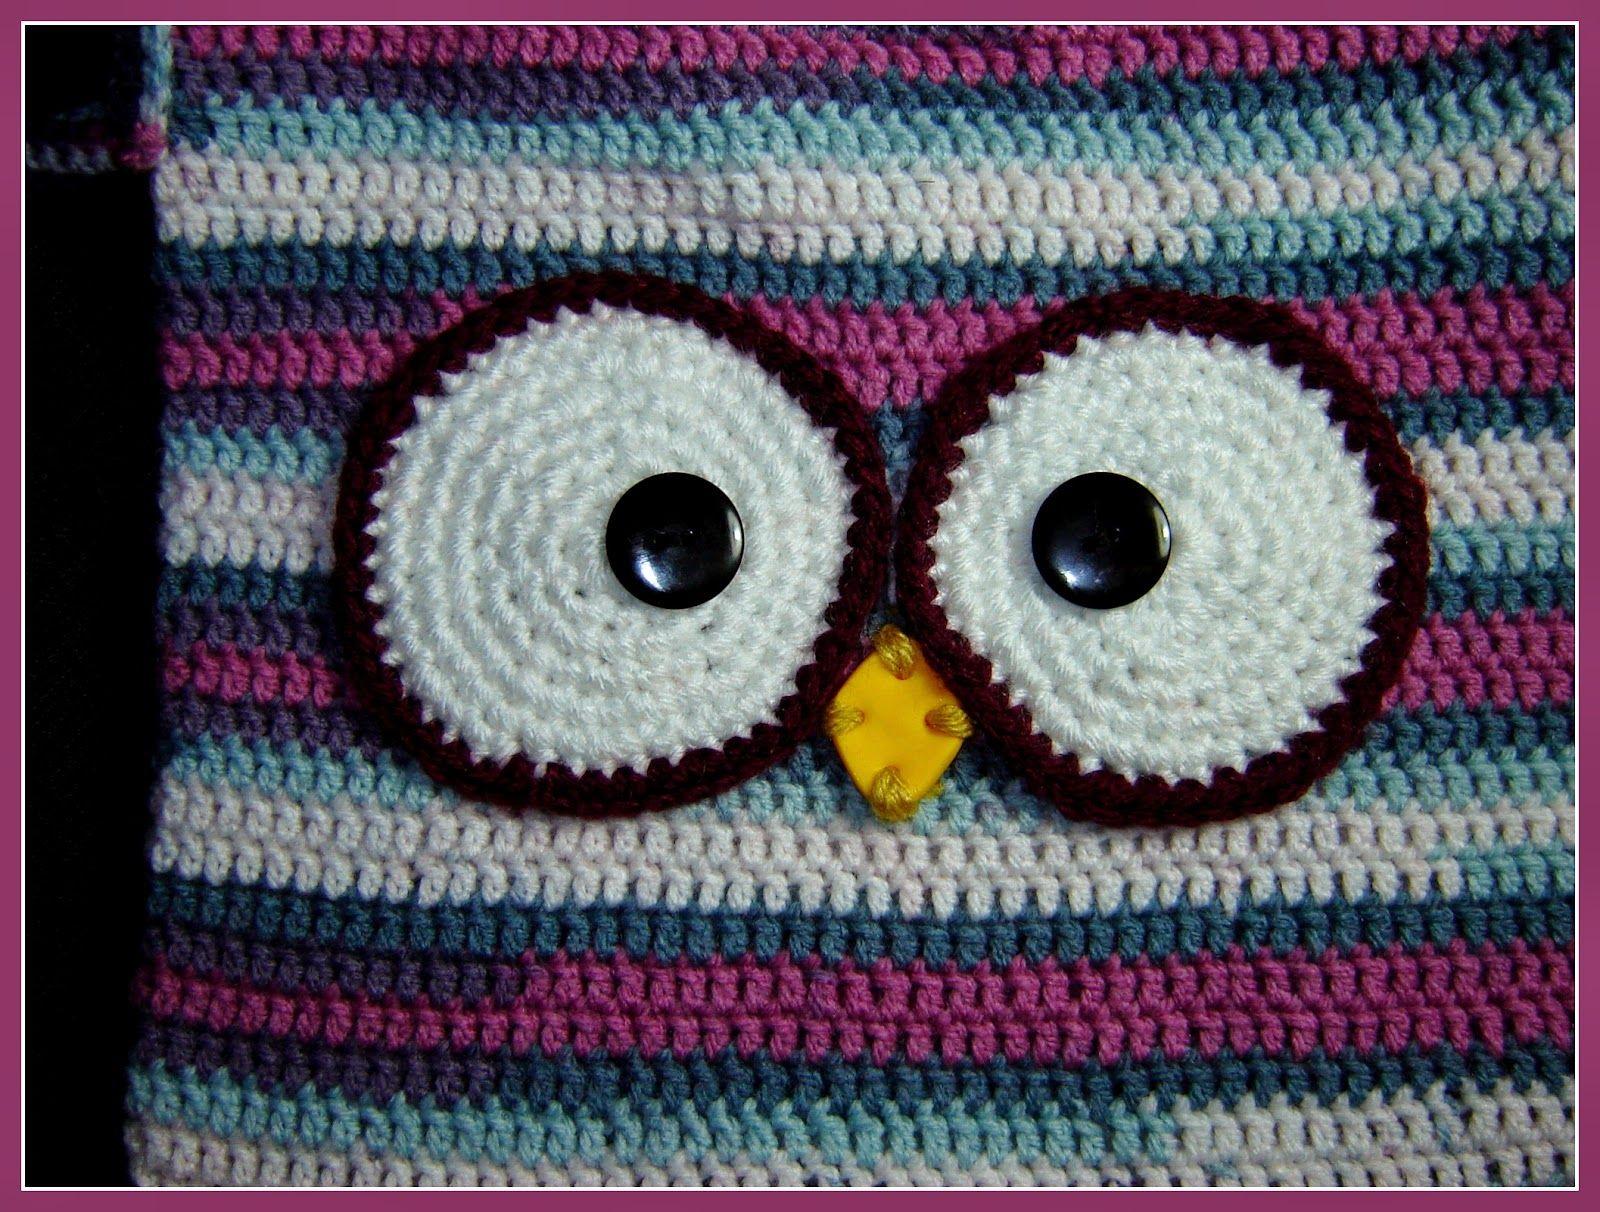 Taller campesino borsa gufffy crochet owl crochet bag http taller campesino borsa gufffy crochet owl crochet bag httptallercampesino bankloansurffo Image collections